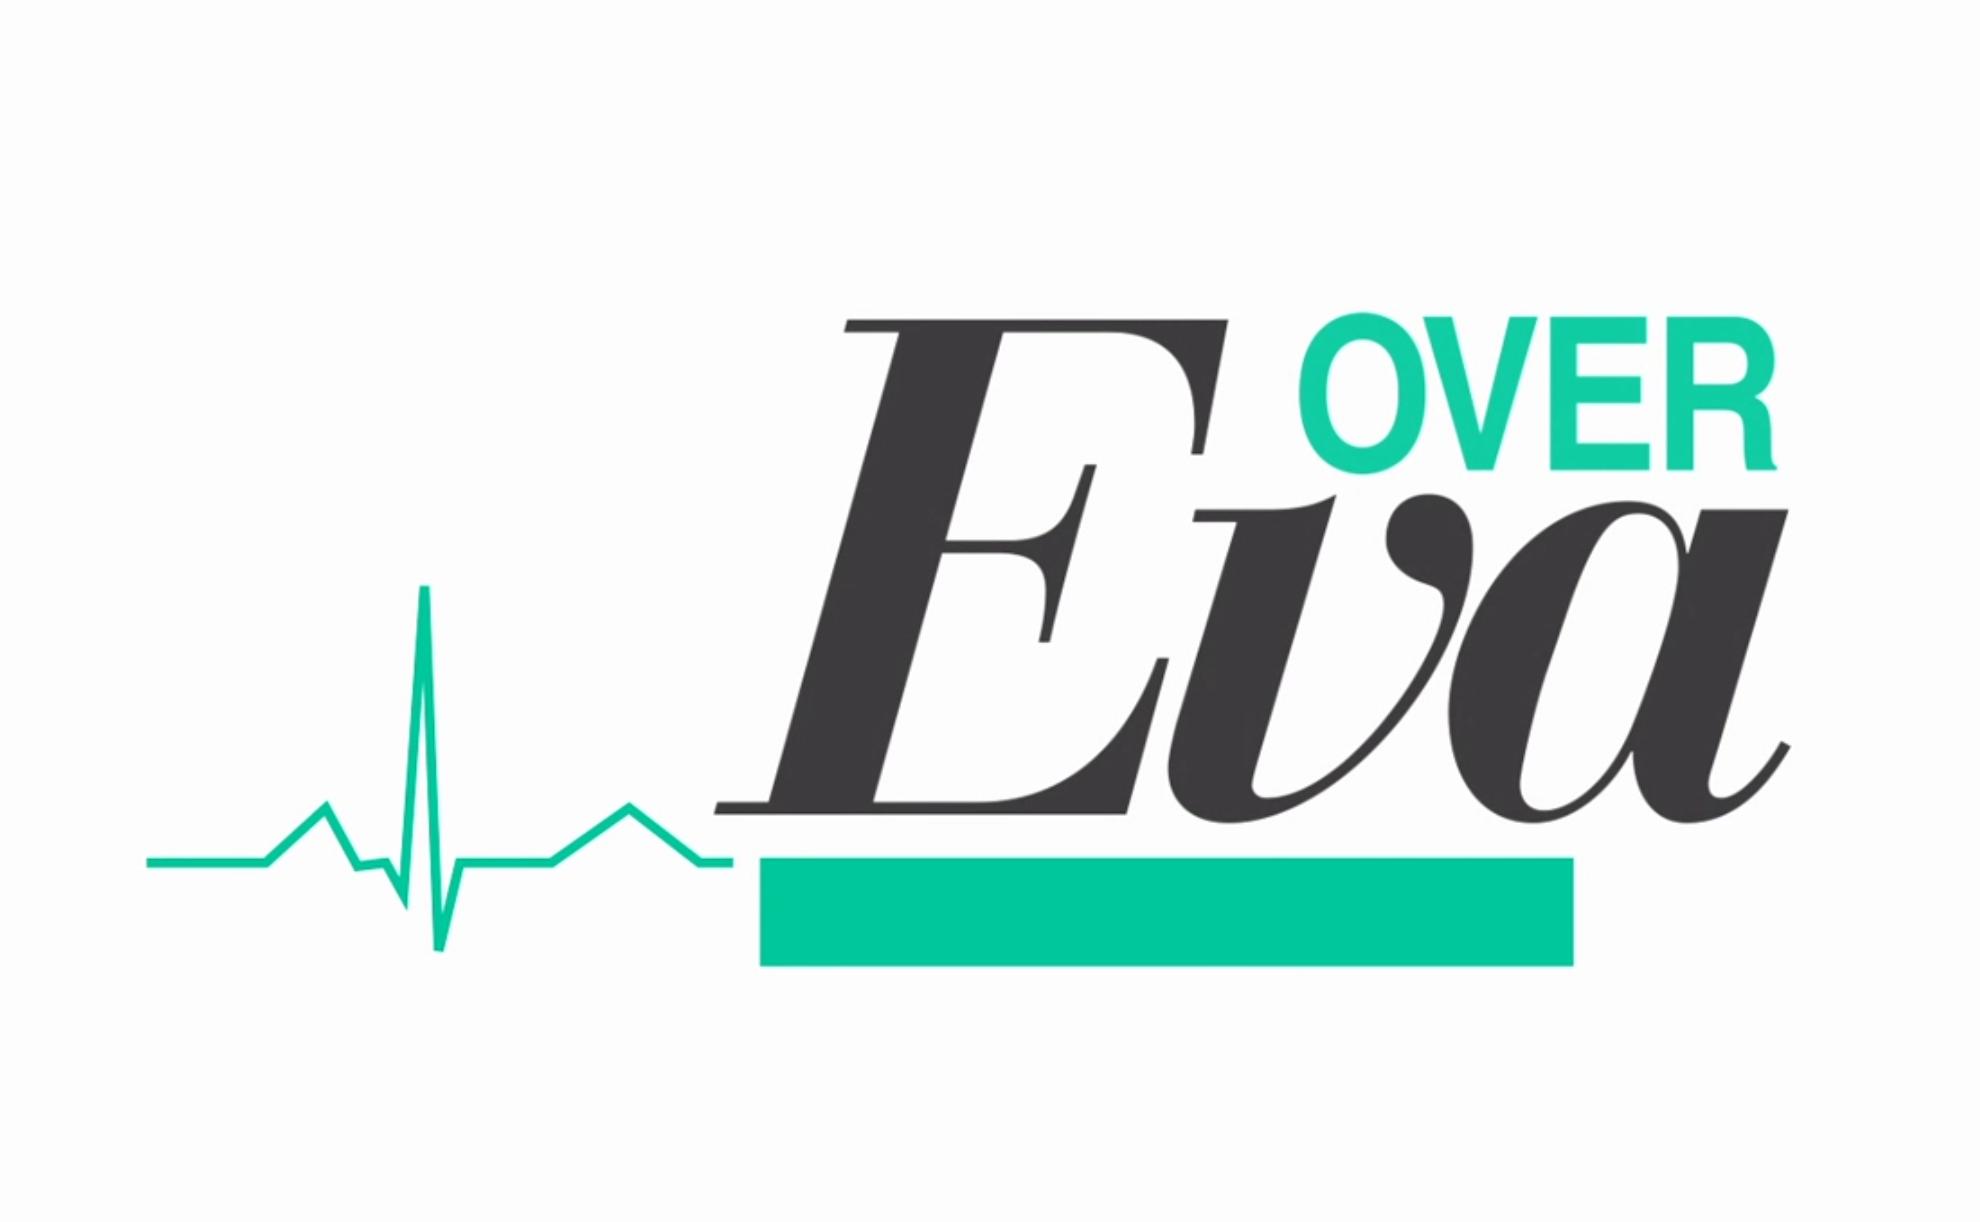 Over Eva aflevering #10: Irritatie en vernedering